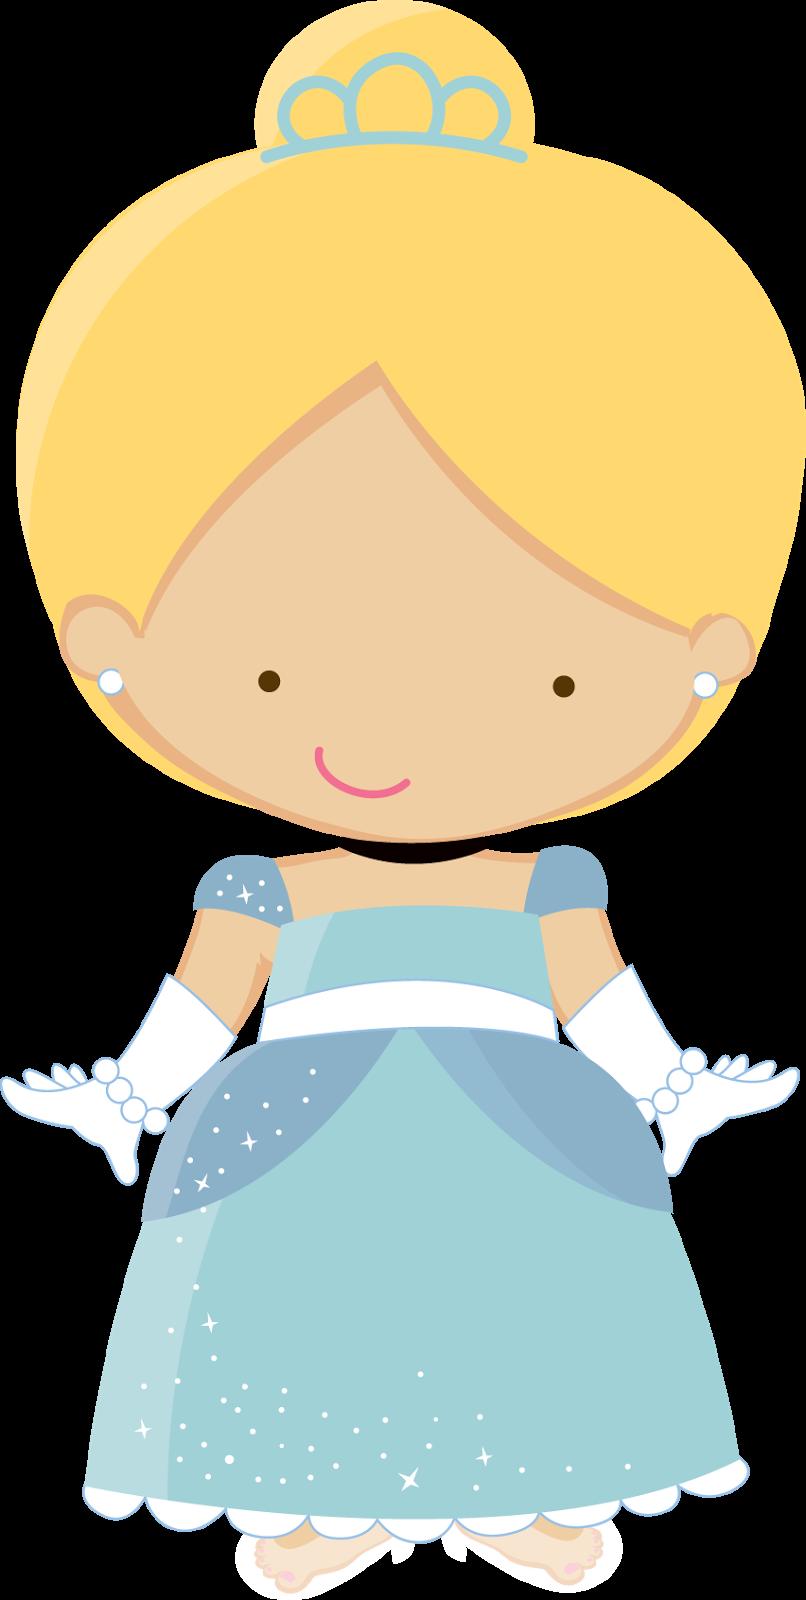 Convite cinderela cute pesquisa. Clipart free princess